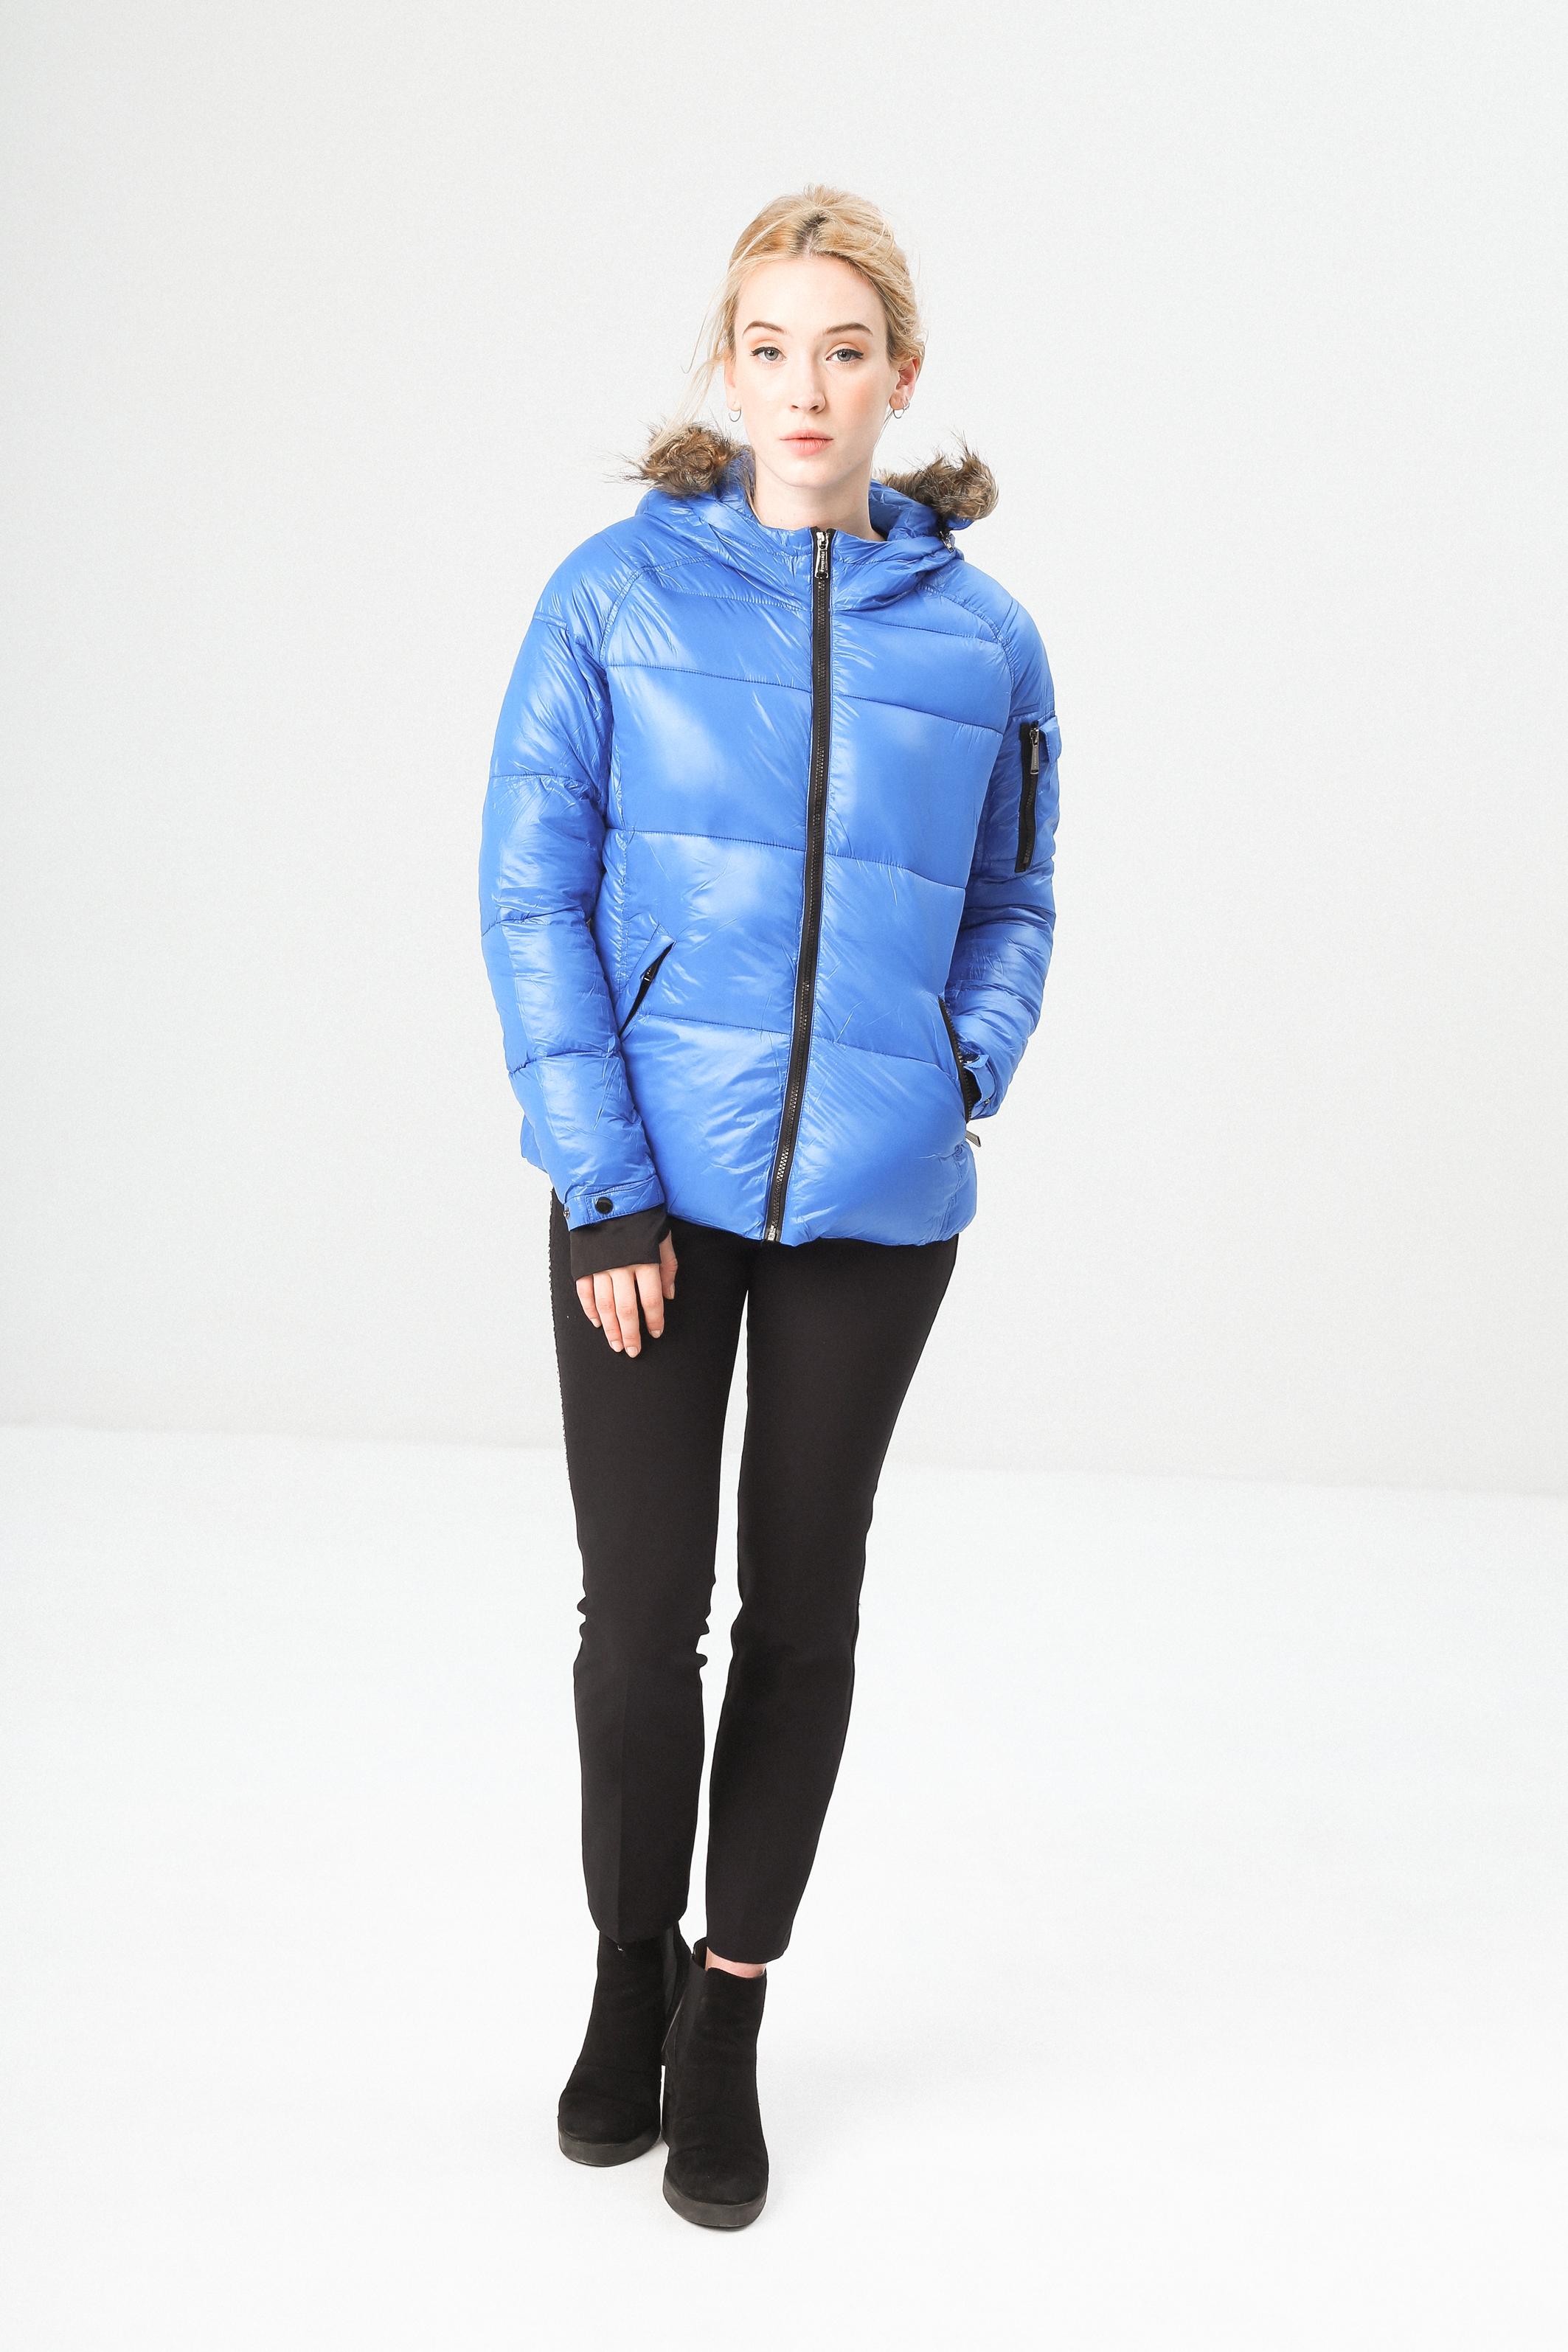 Vestes & blousons  Fontana 2.0 GAIA blue